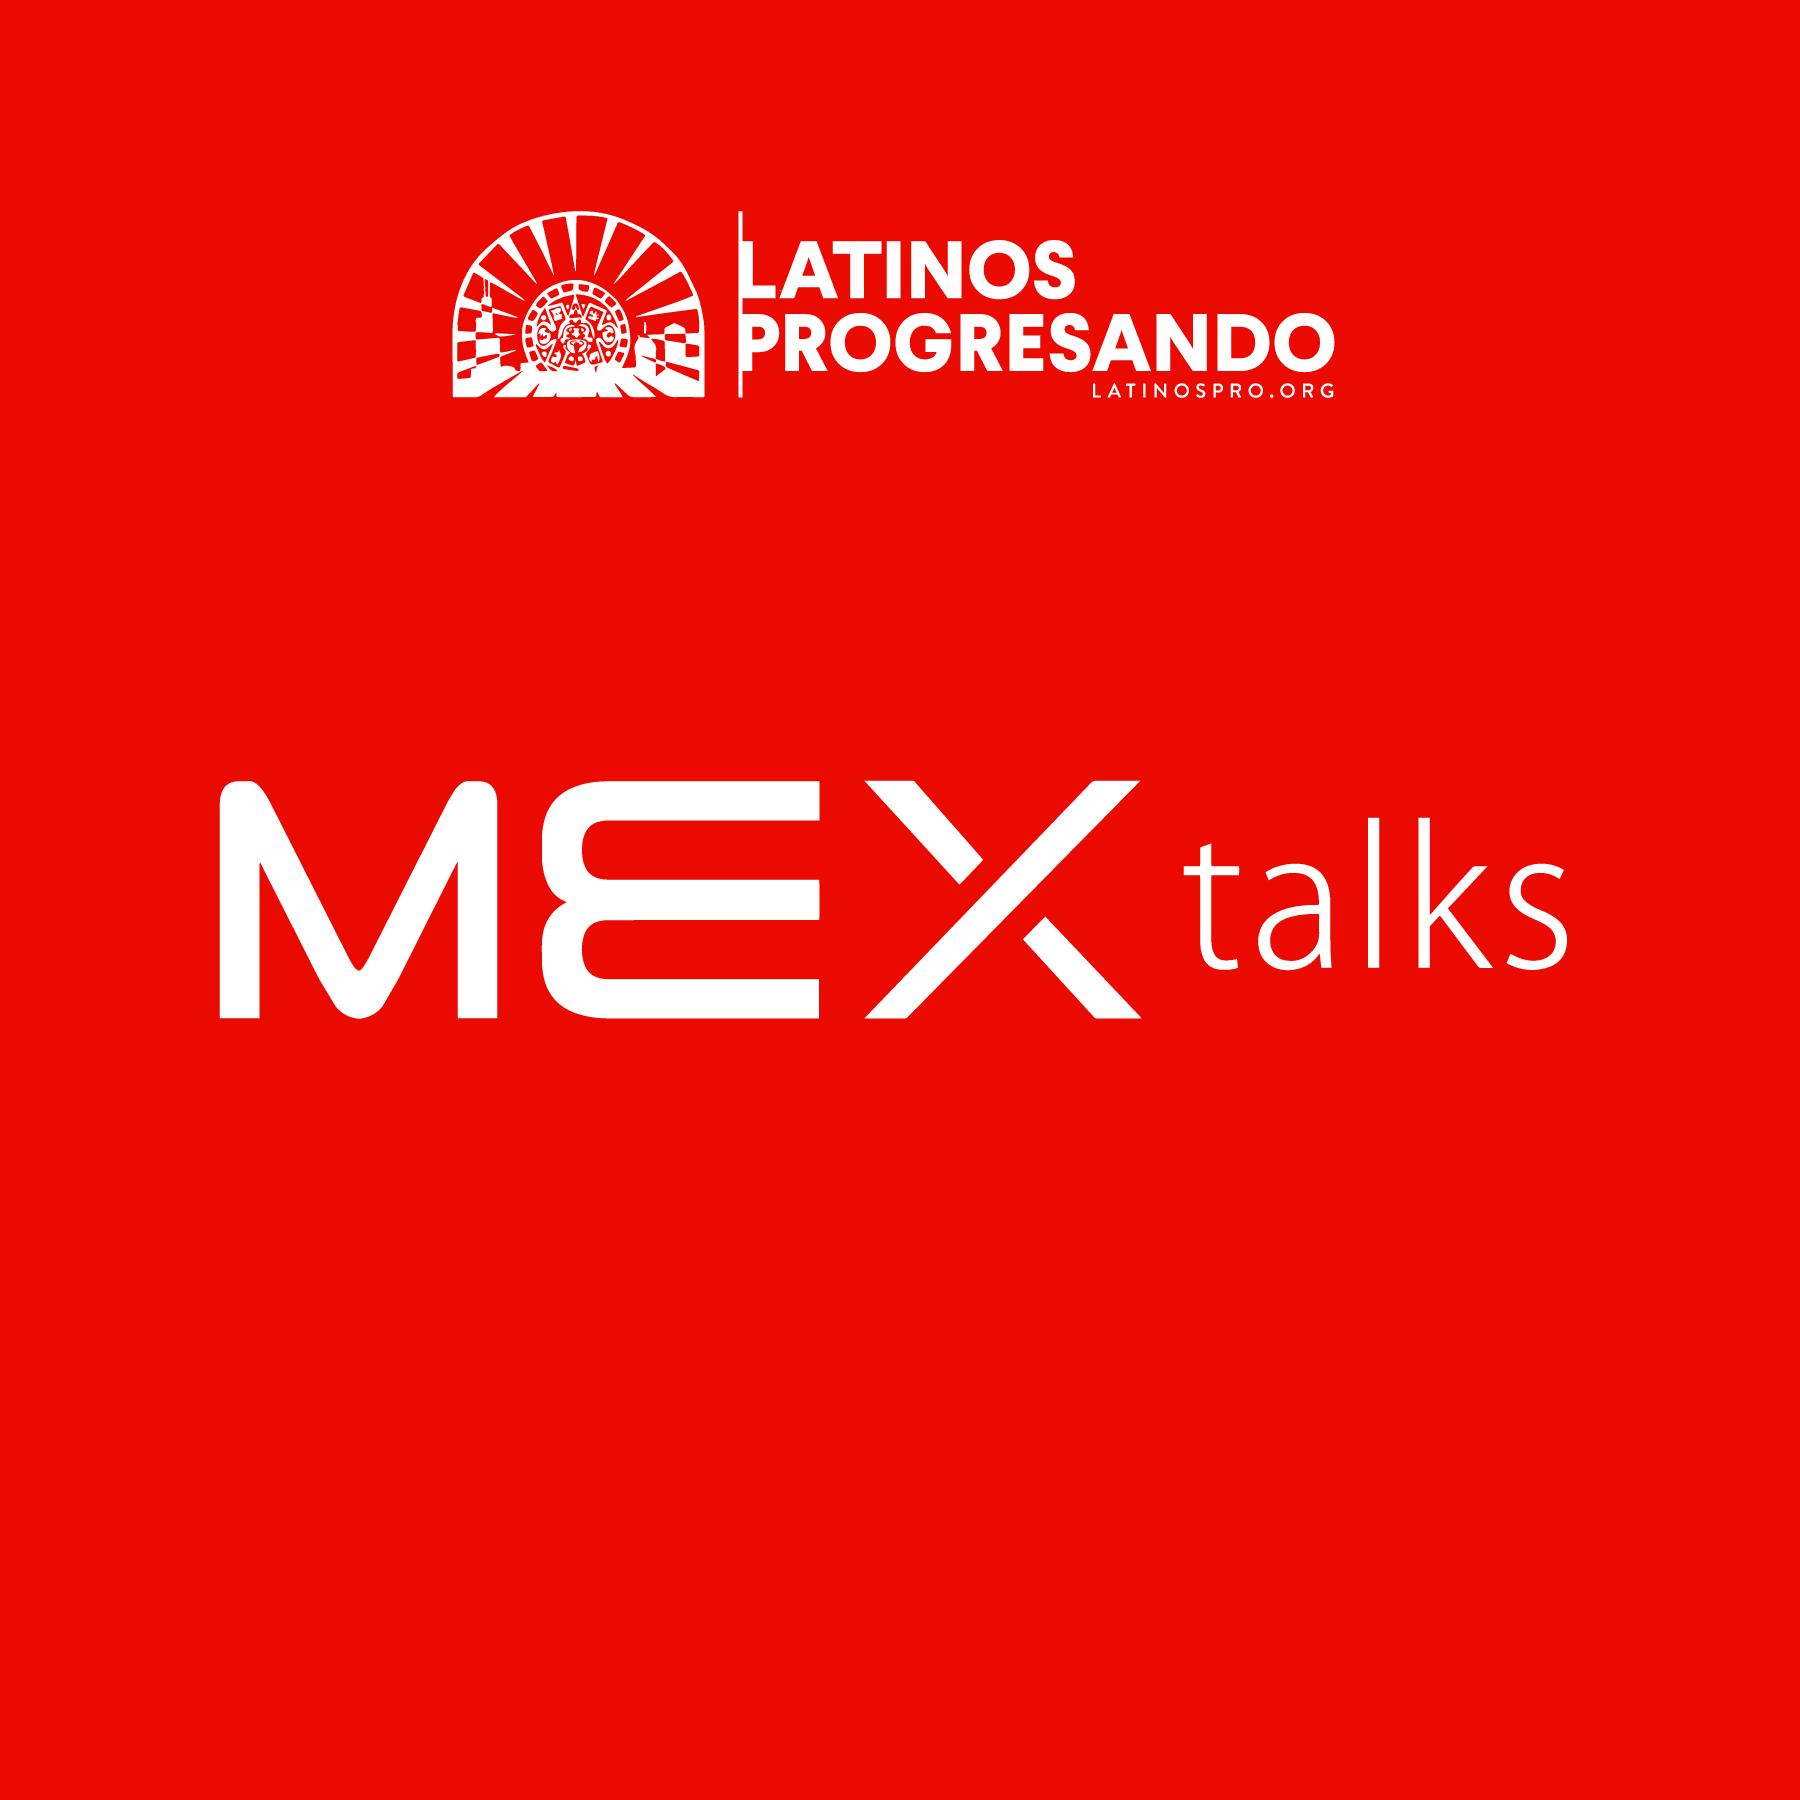 MEX talks - Latinos Progresando